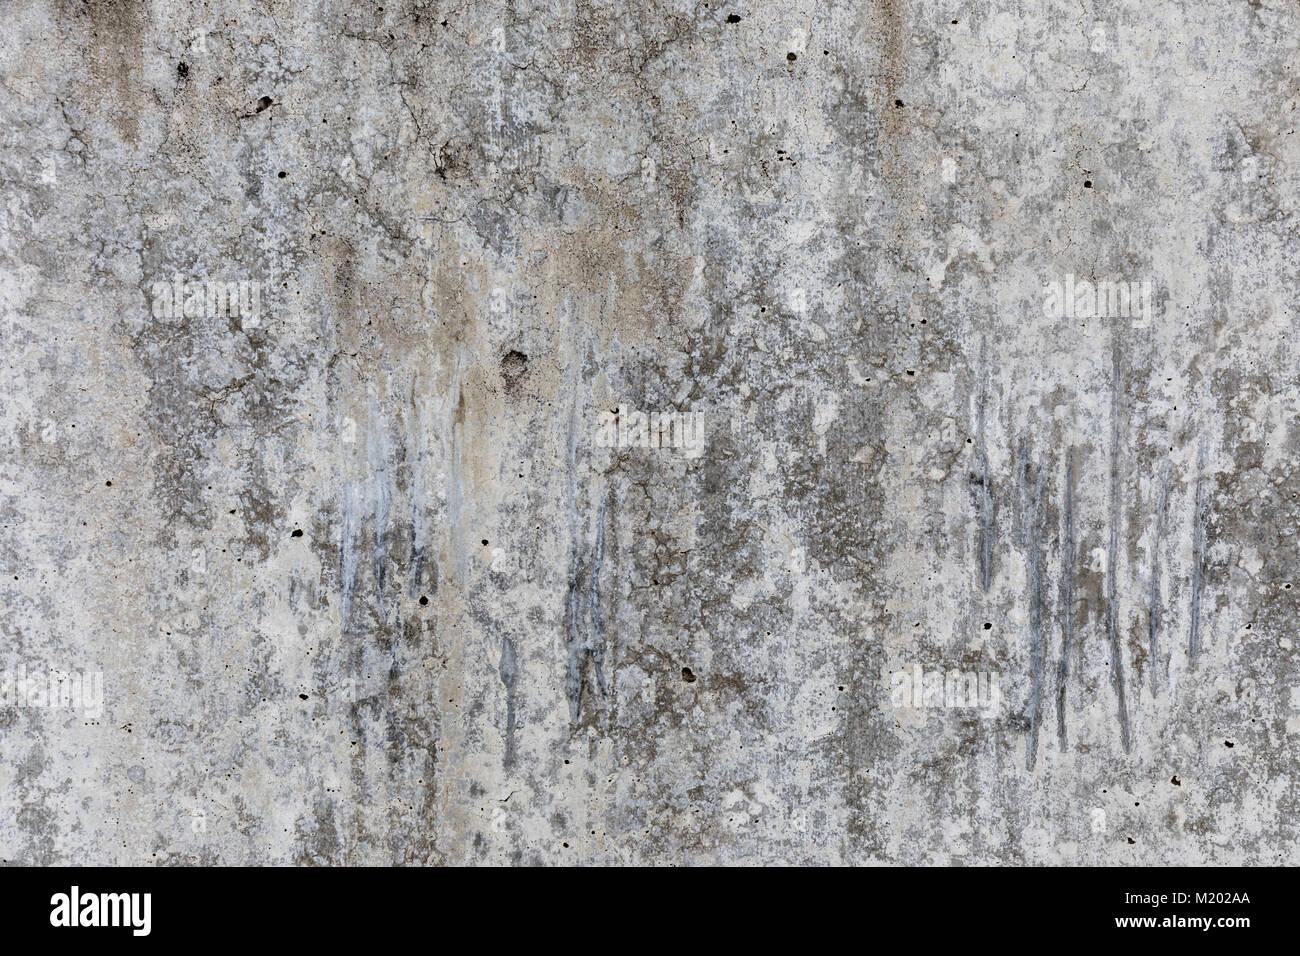 Weathered concrete wall; Suginami, Tokyo - Stock Image